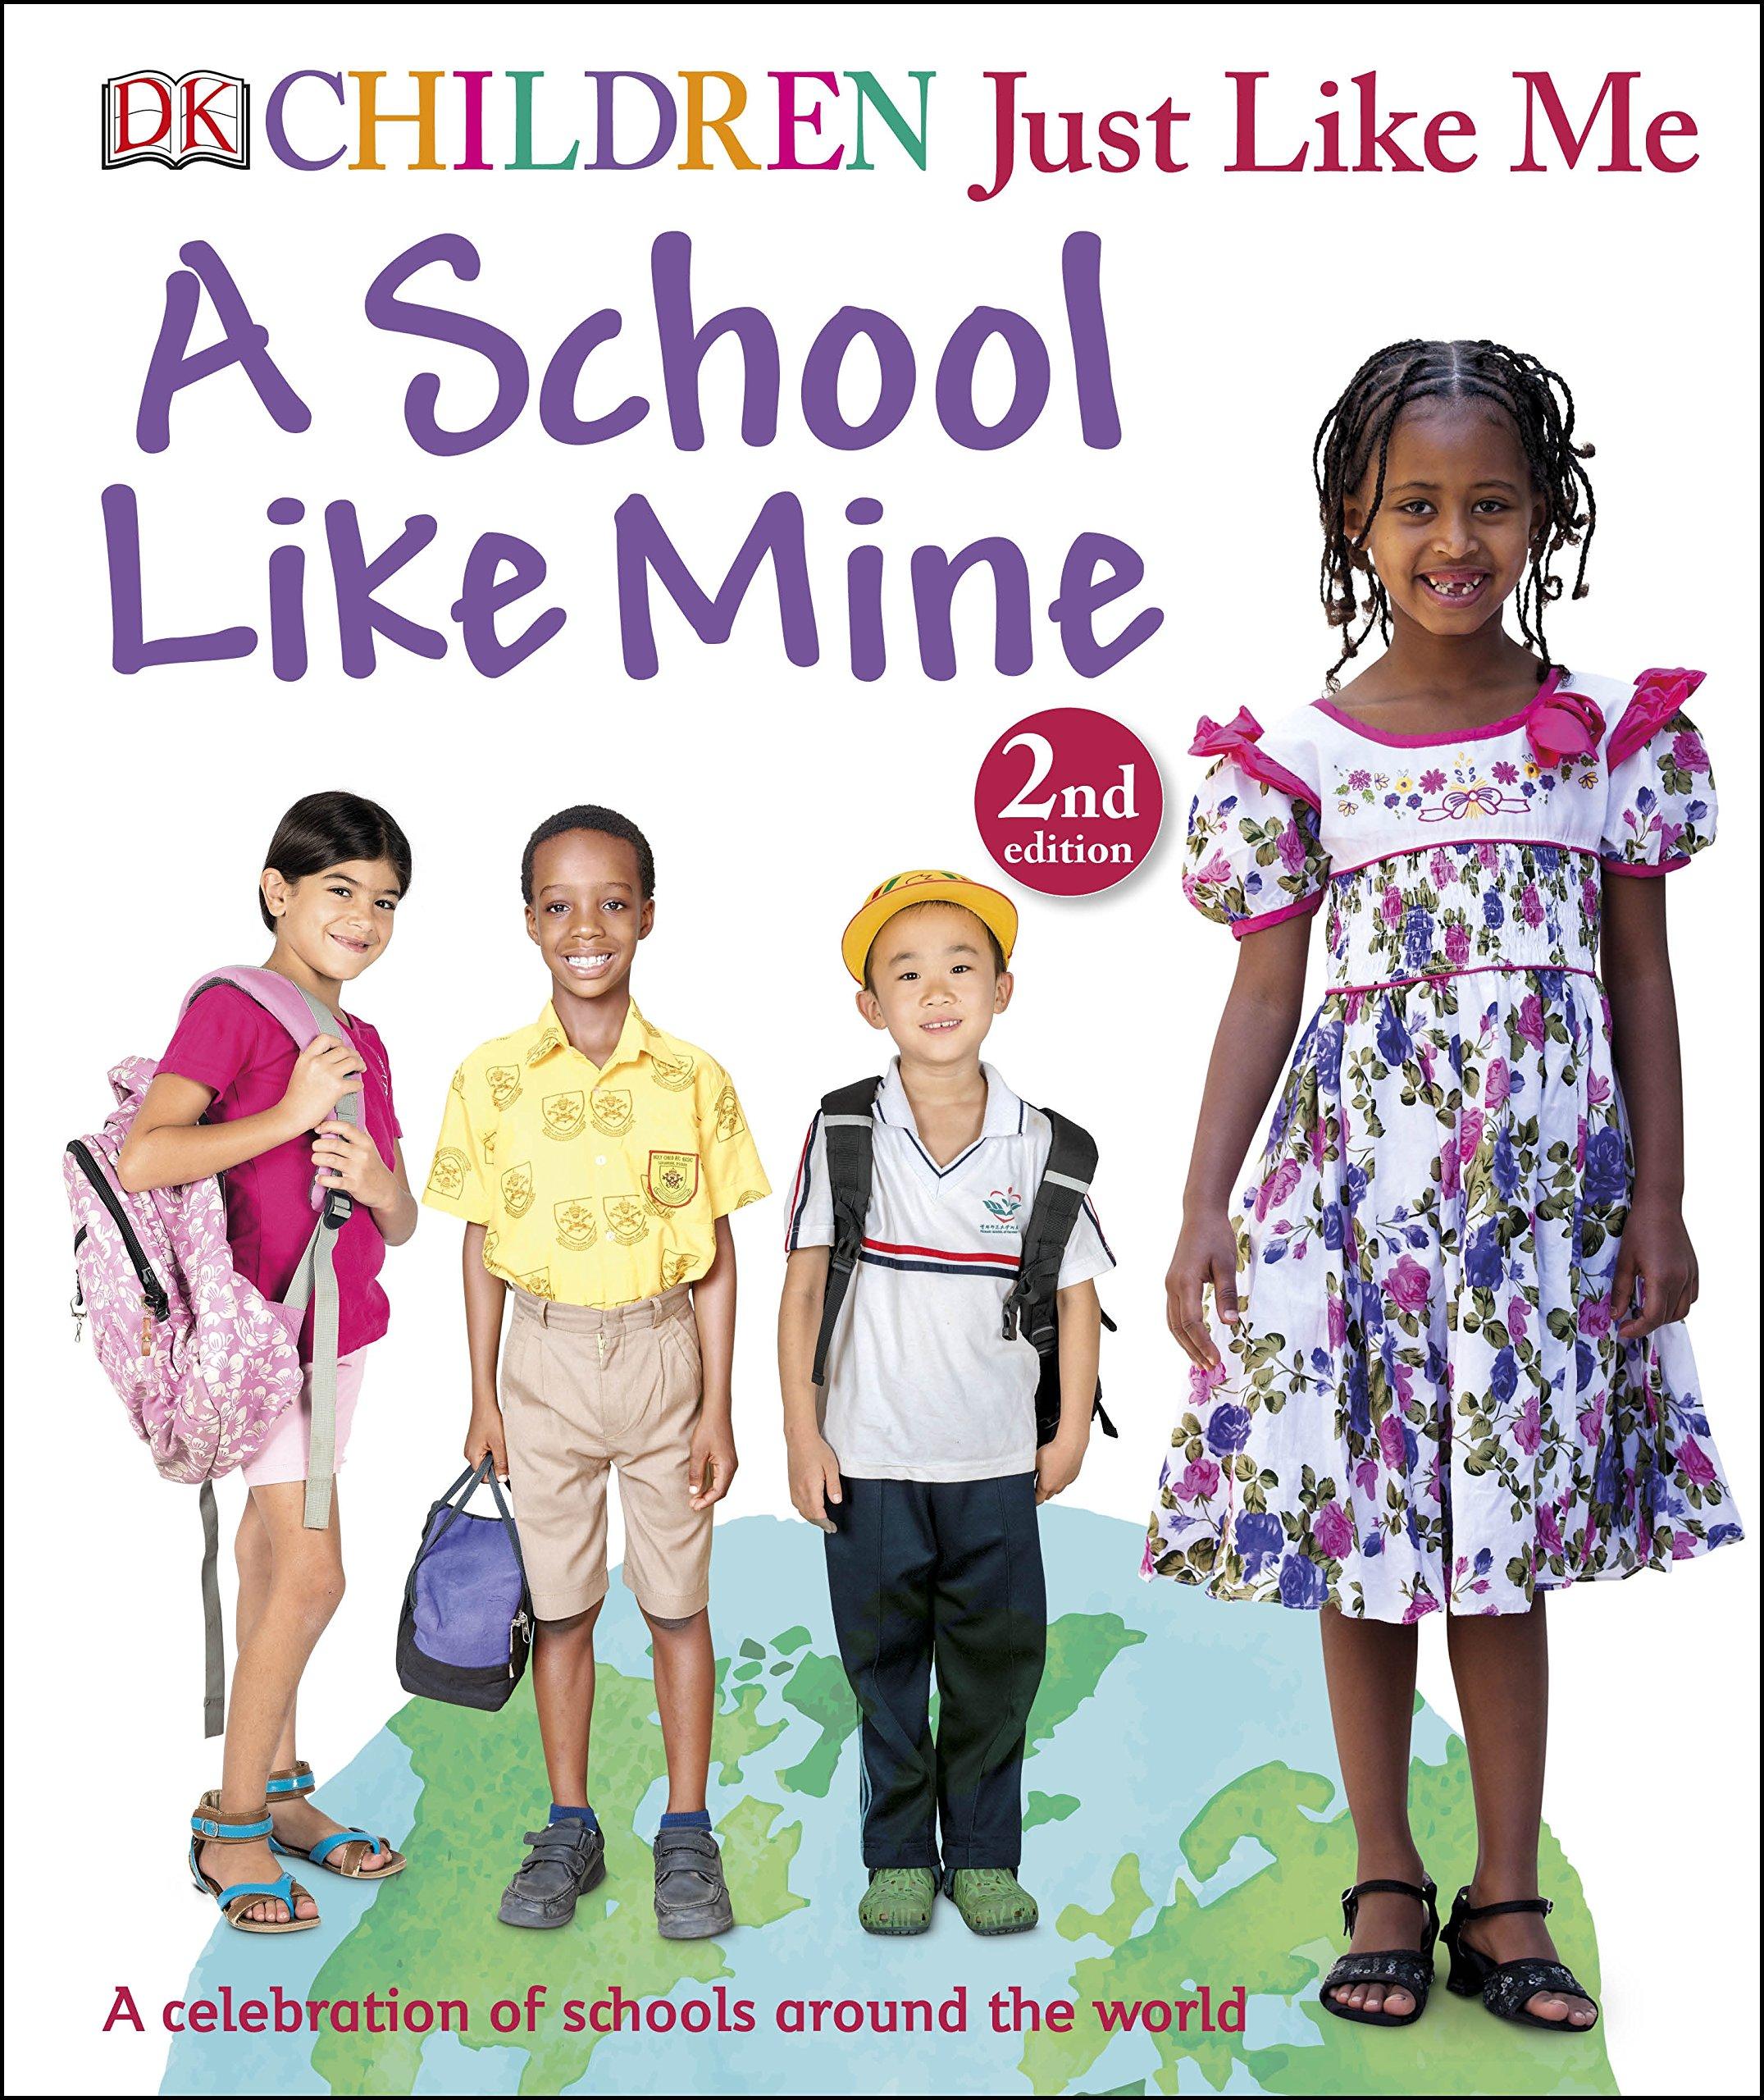 A School Like Mine (Children Just Like Me): Amazon.co.uk: DK:  9780241207369: Books